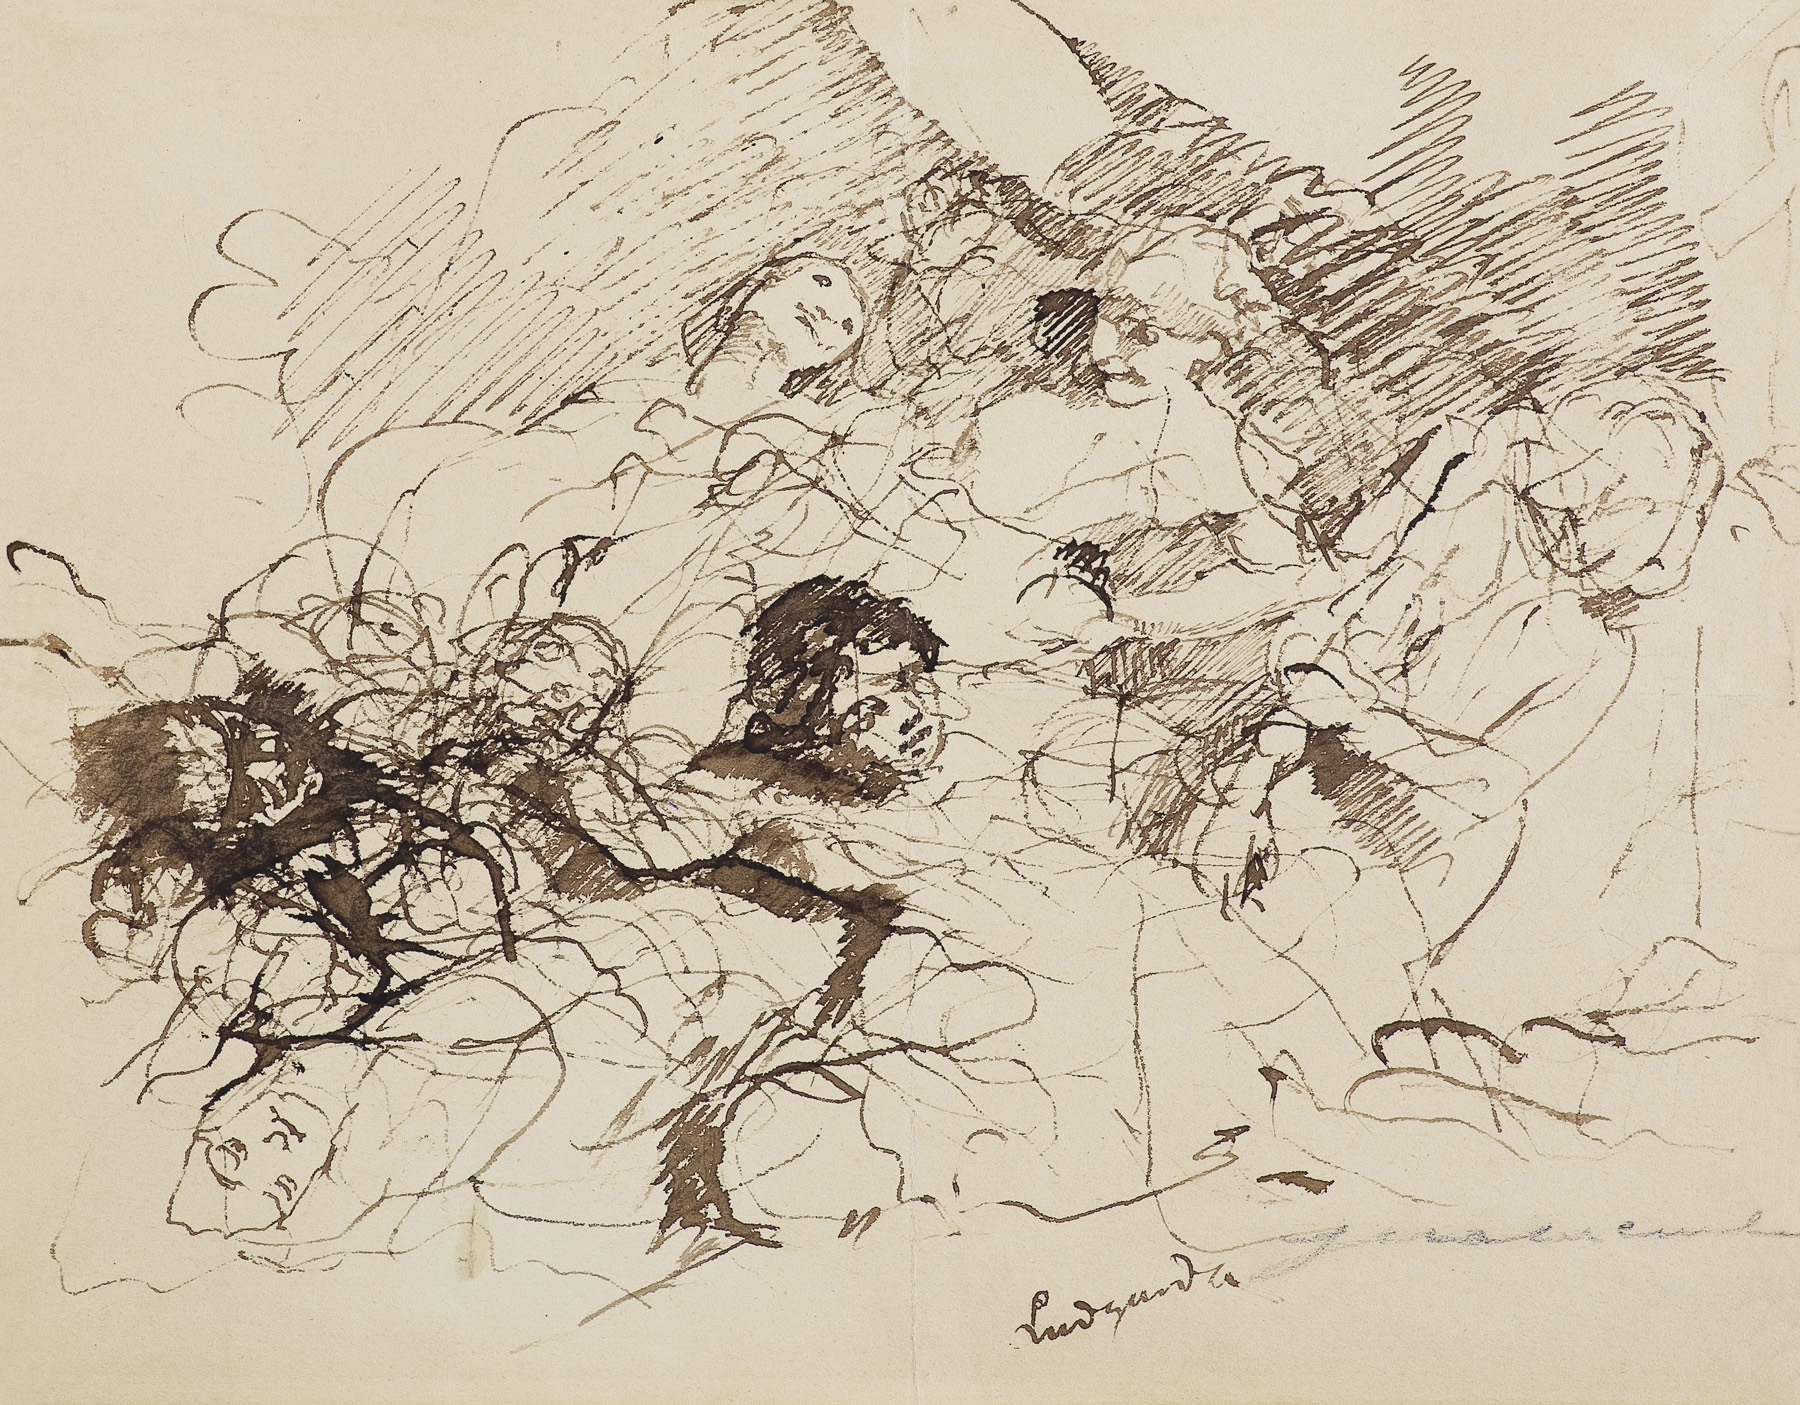 LUDGARDA 1877